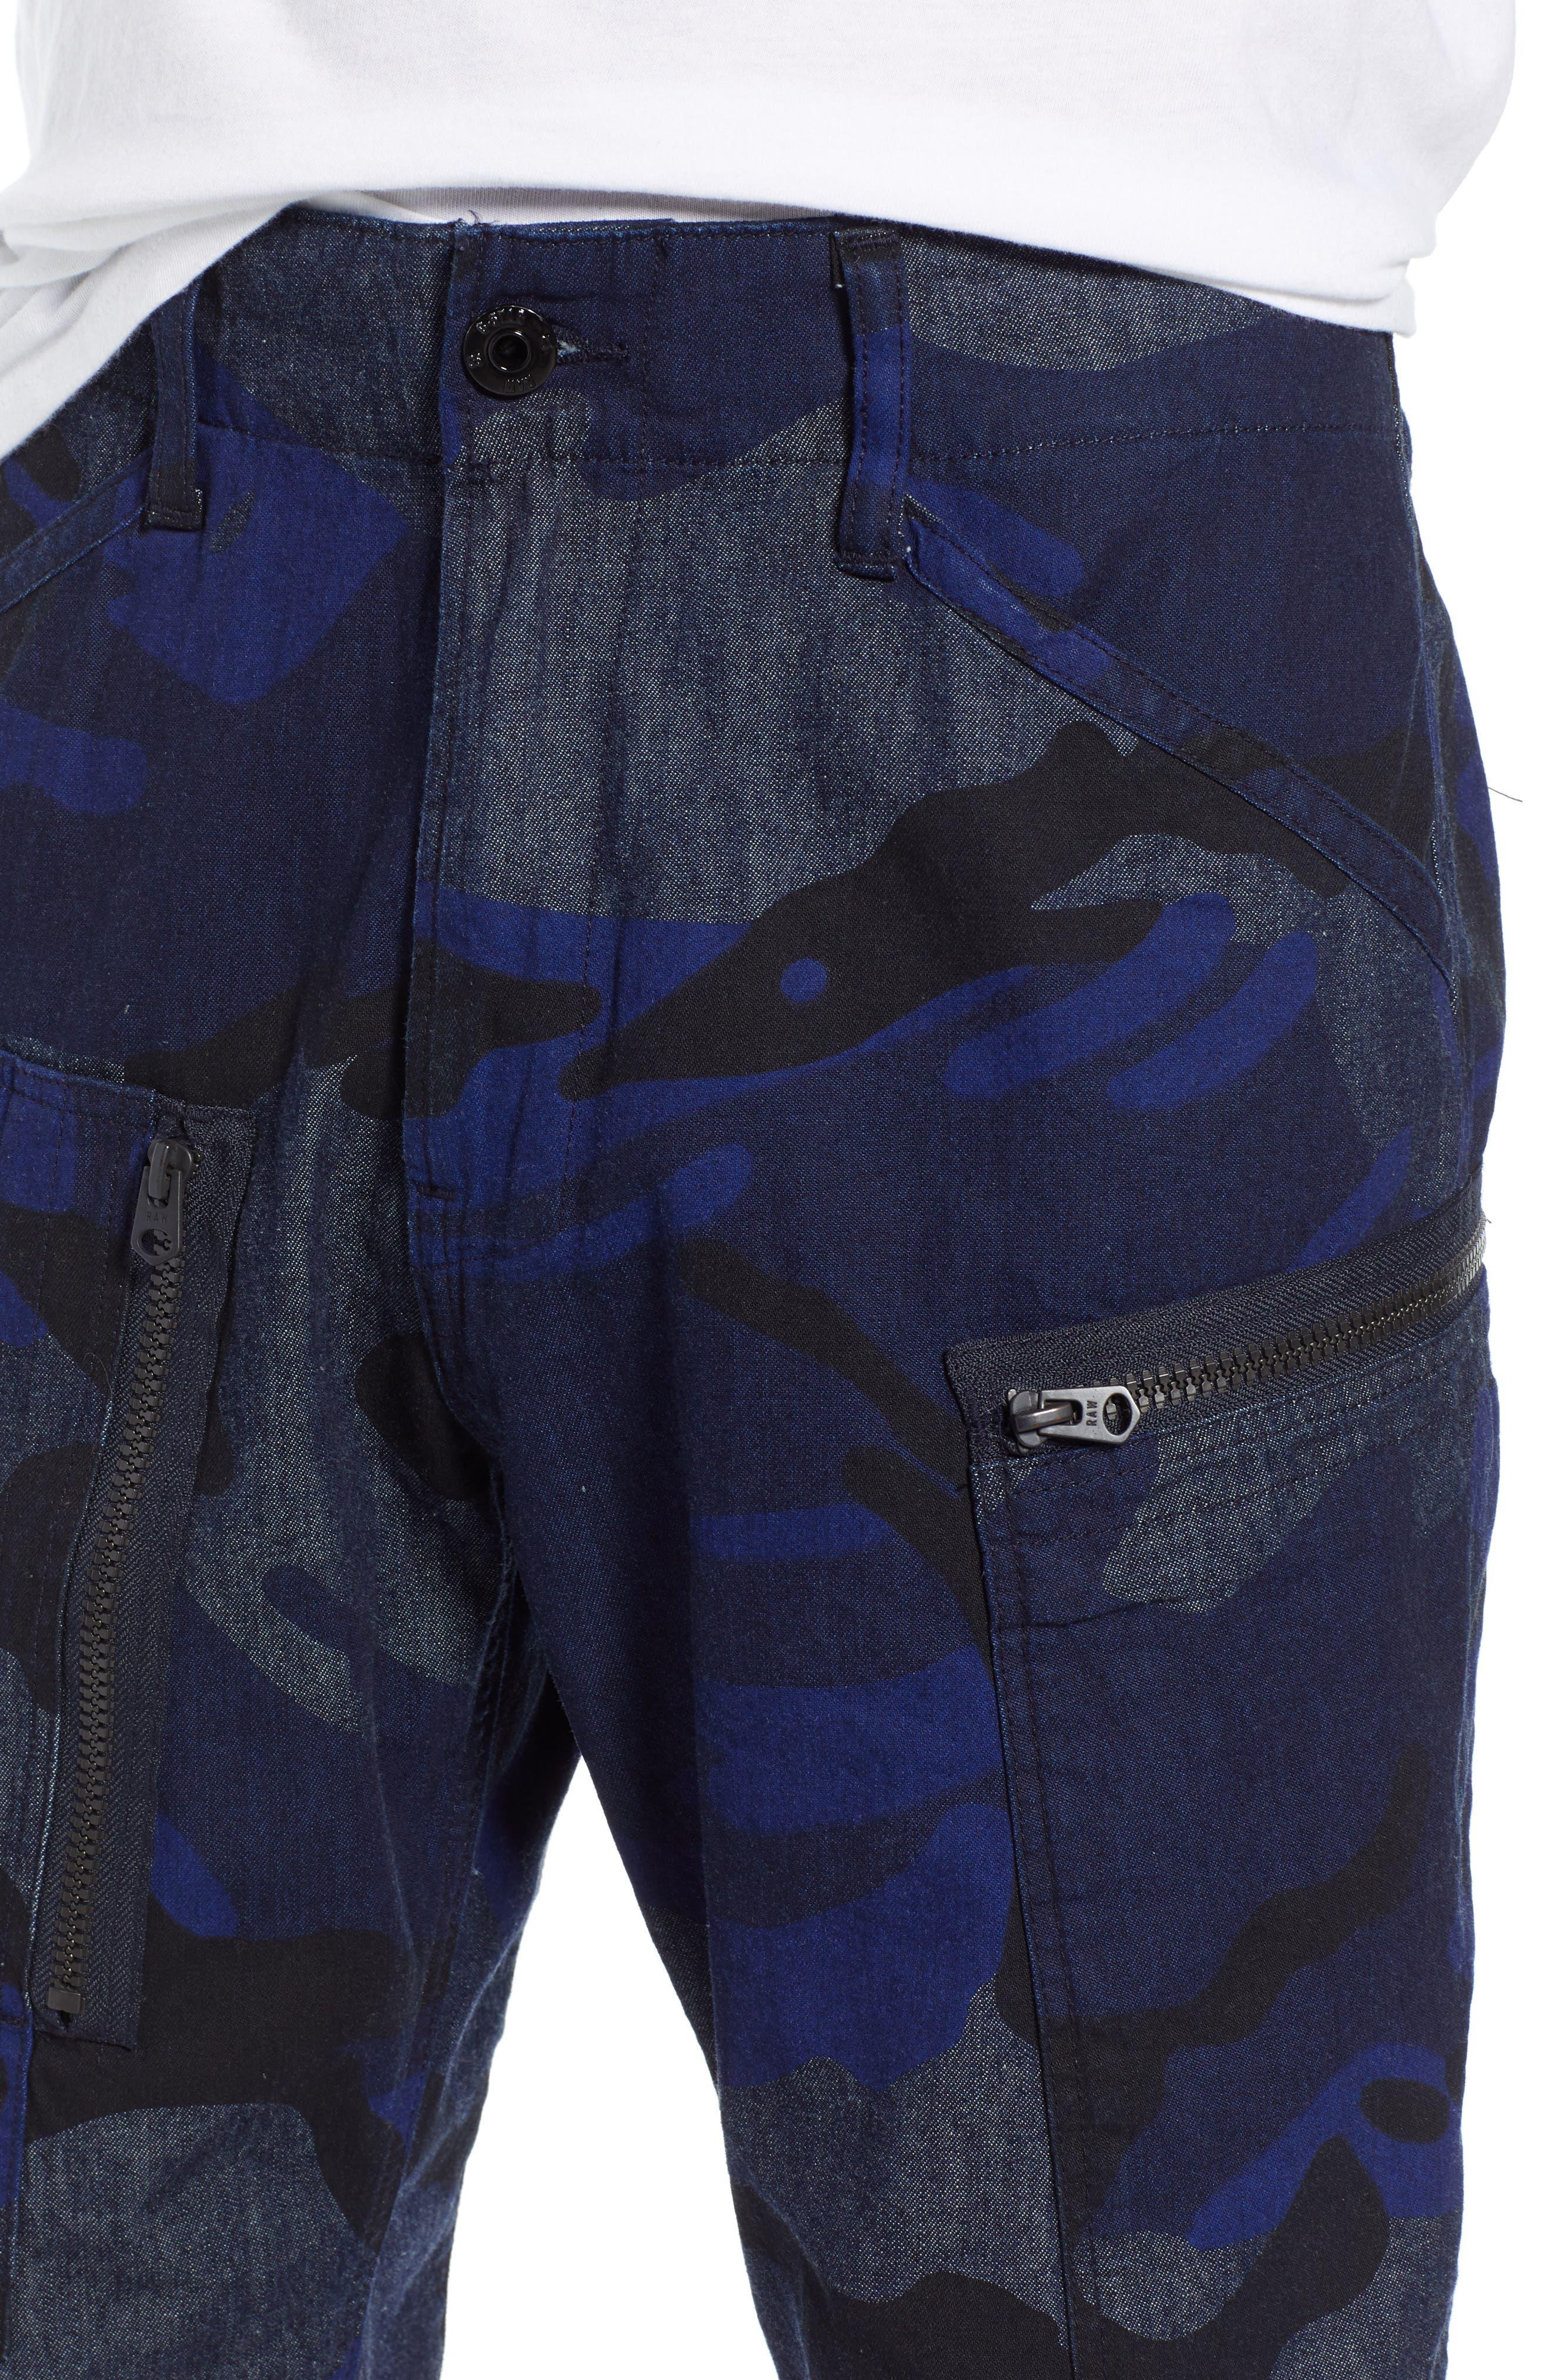 Powel Tapered Pants,                             Alternate thumbnail 4, color,                             RAW DENIM/ PHANTOM BLUE